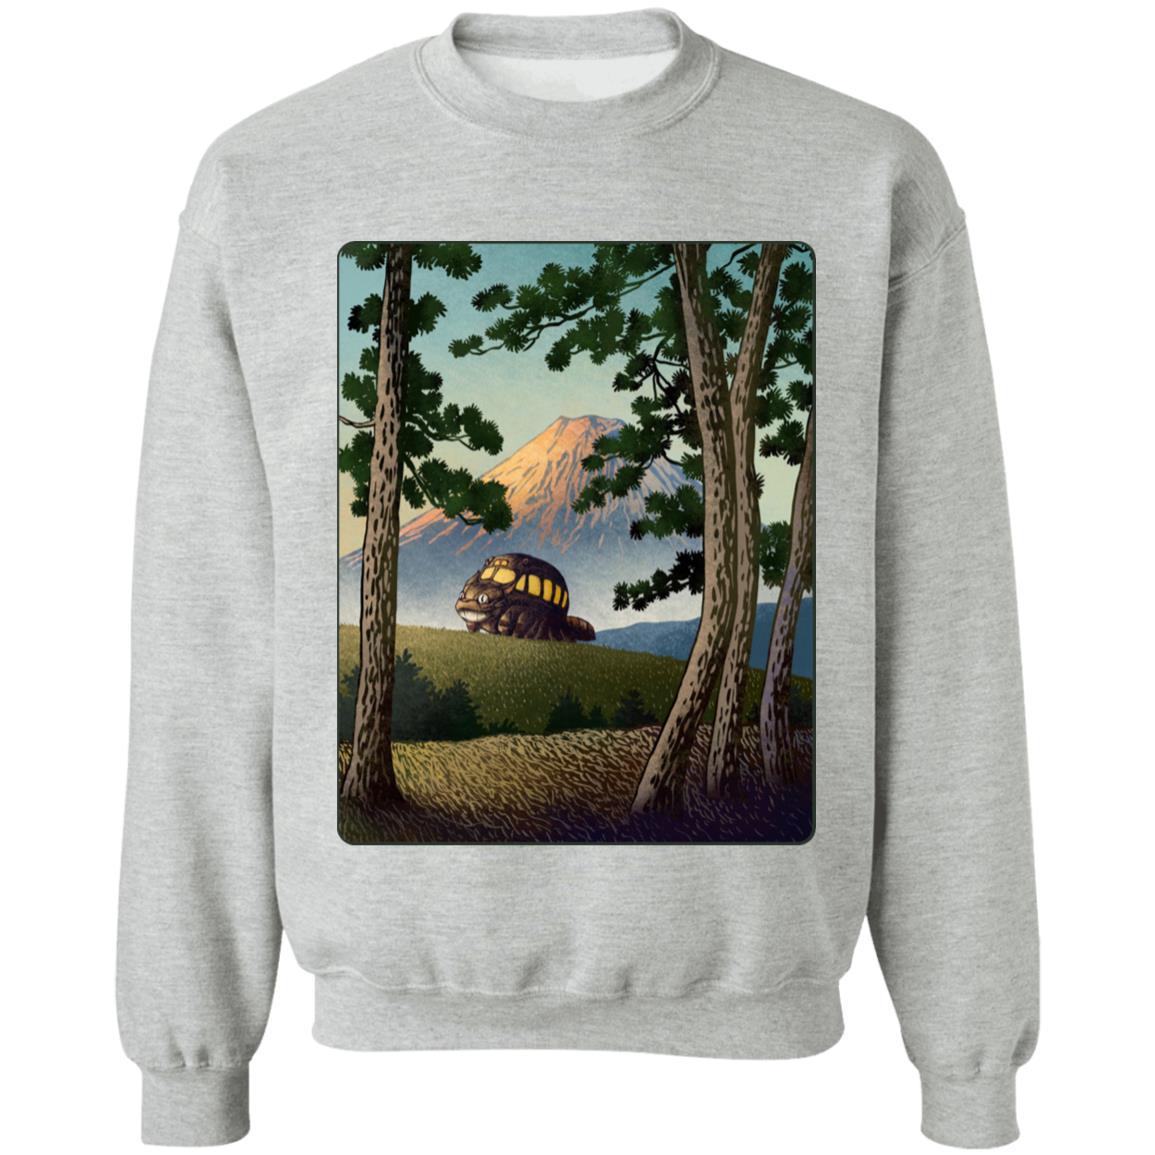 My Neighbor Totoro – Catbus Landscape Sweatshirt